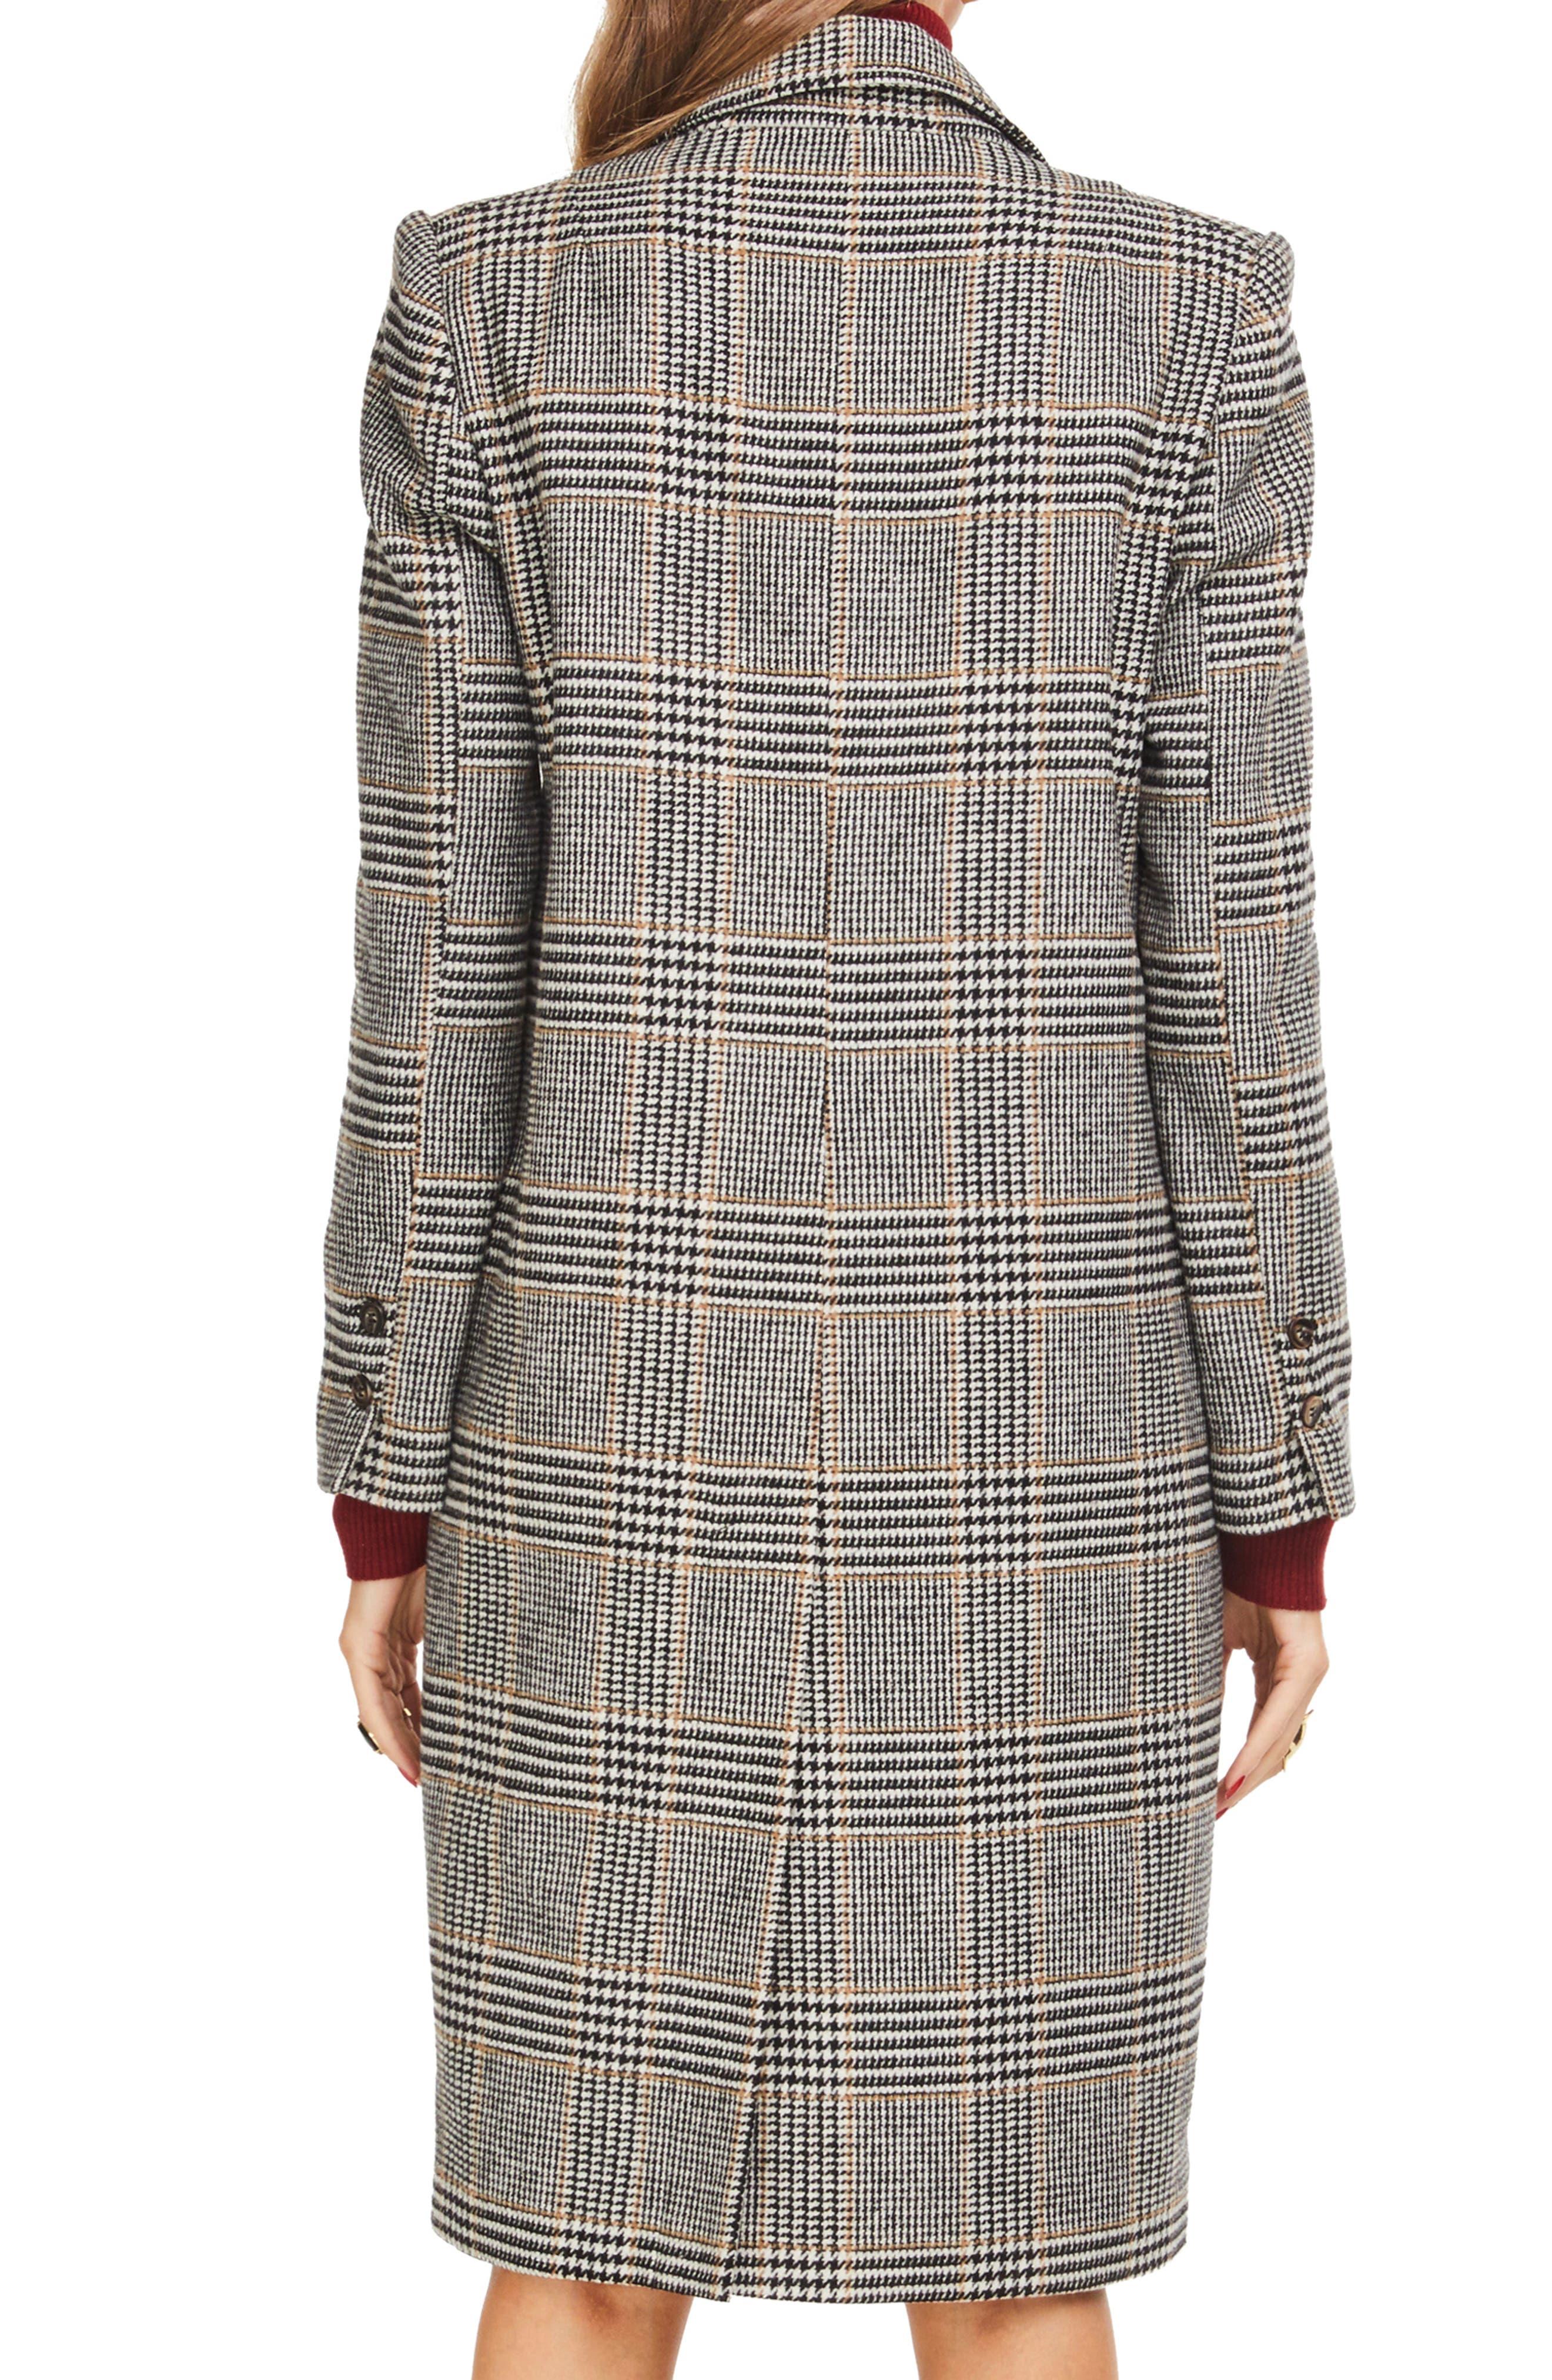 Kensington Plaid Long Coat,                             Alternate thumbnail 2, color,                             BLACK/ MUSTARD PLAID